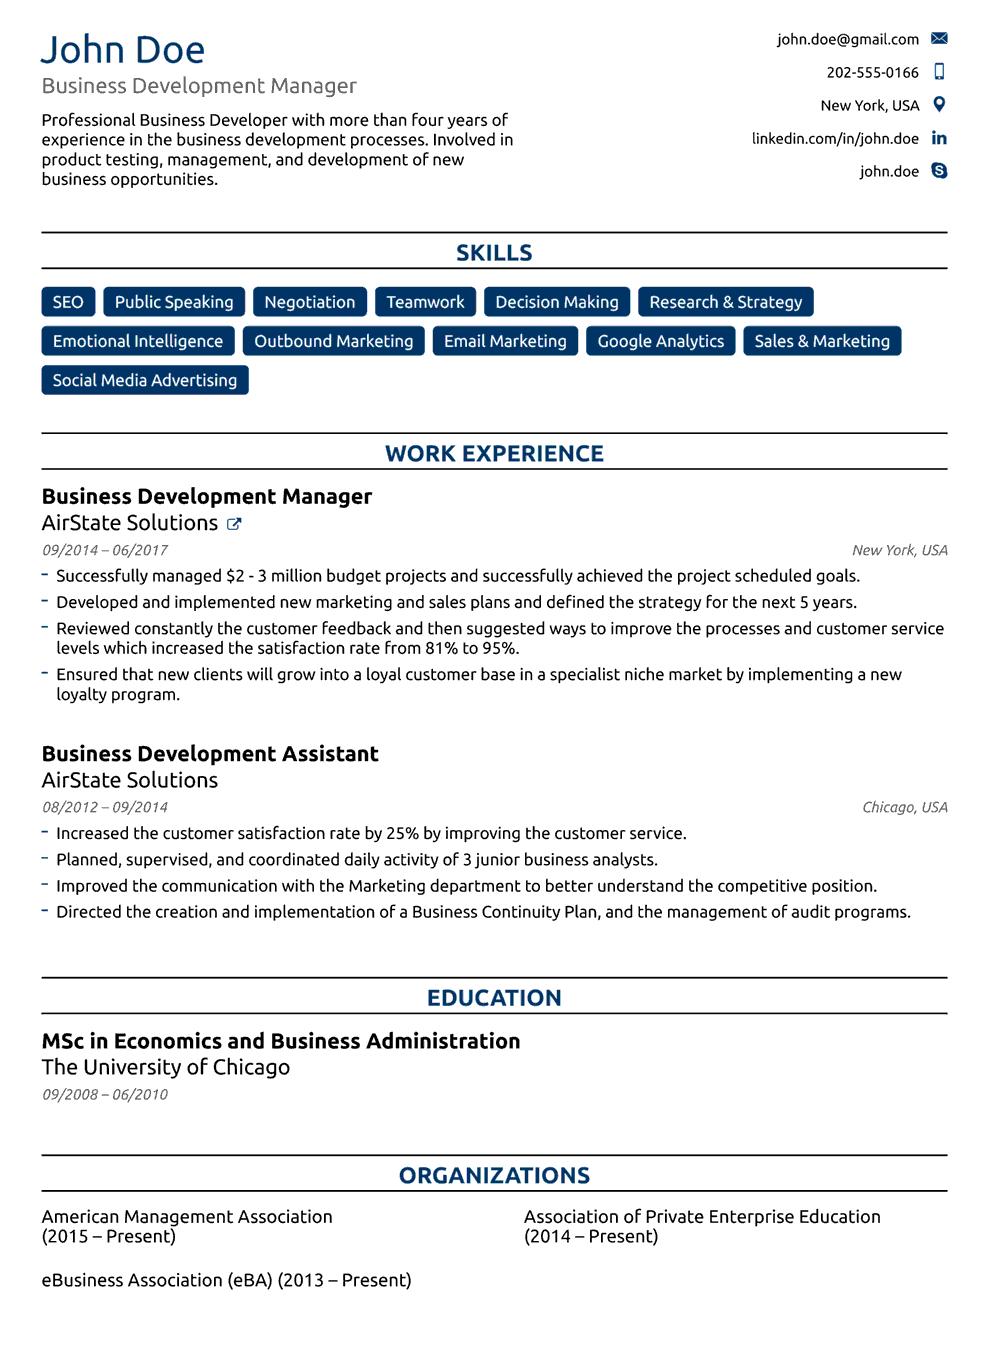 Printable CV Templates